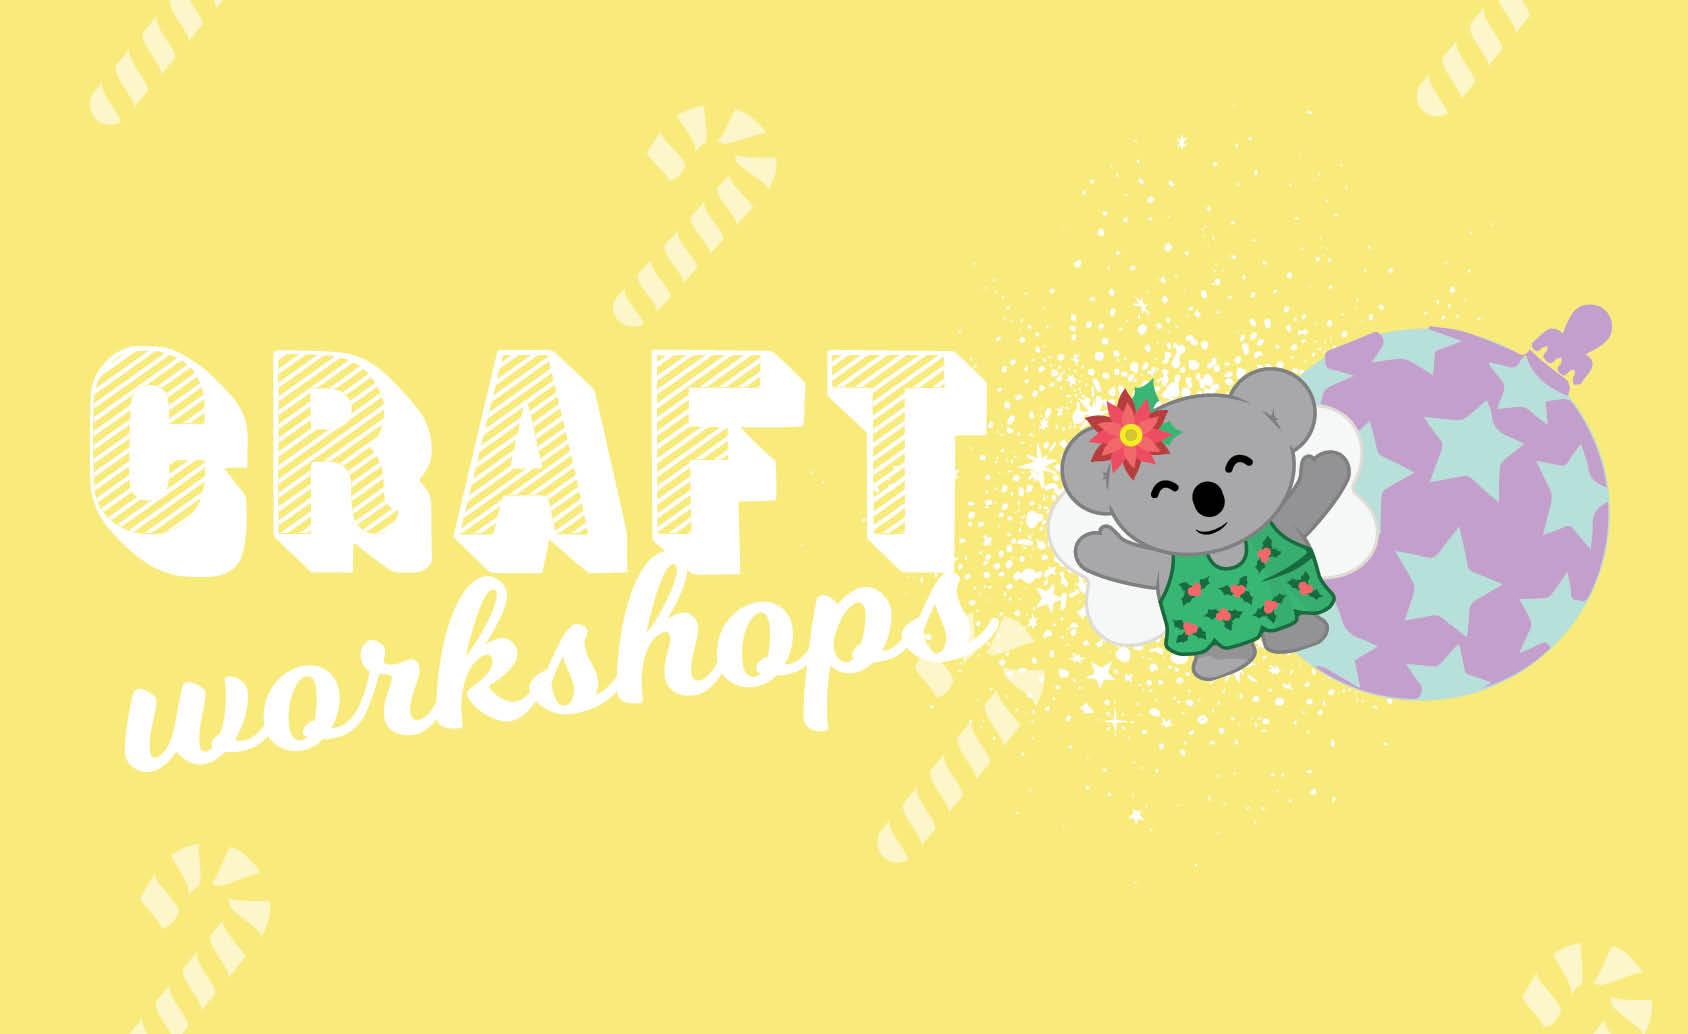 CH4806_Xmas 2019_Web Tiles_Craft Workshop_844x517px